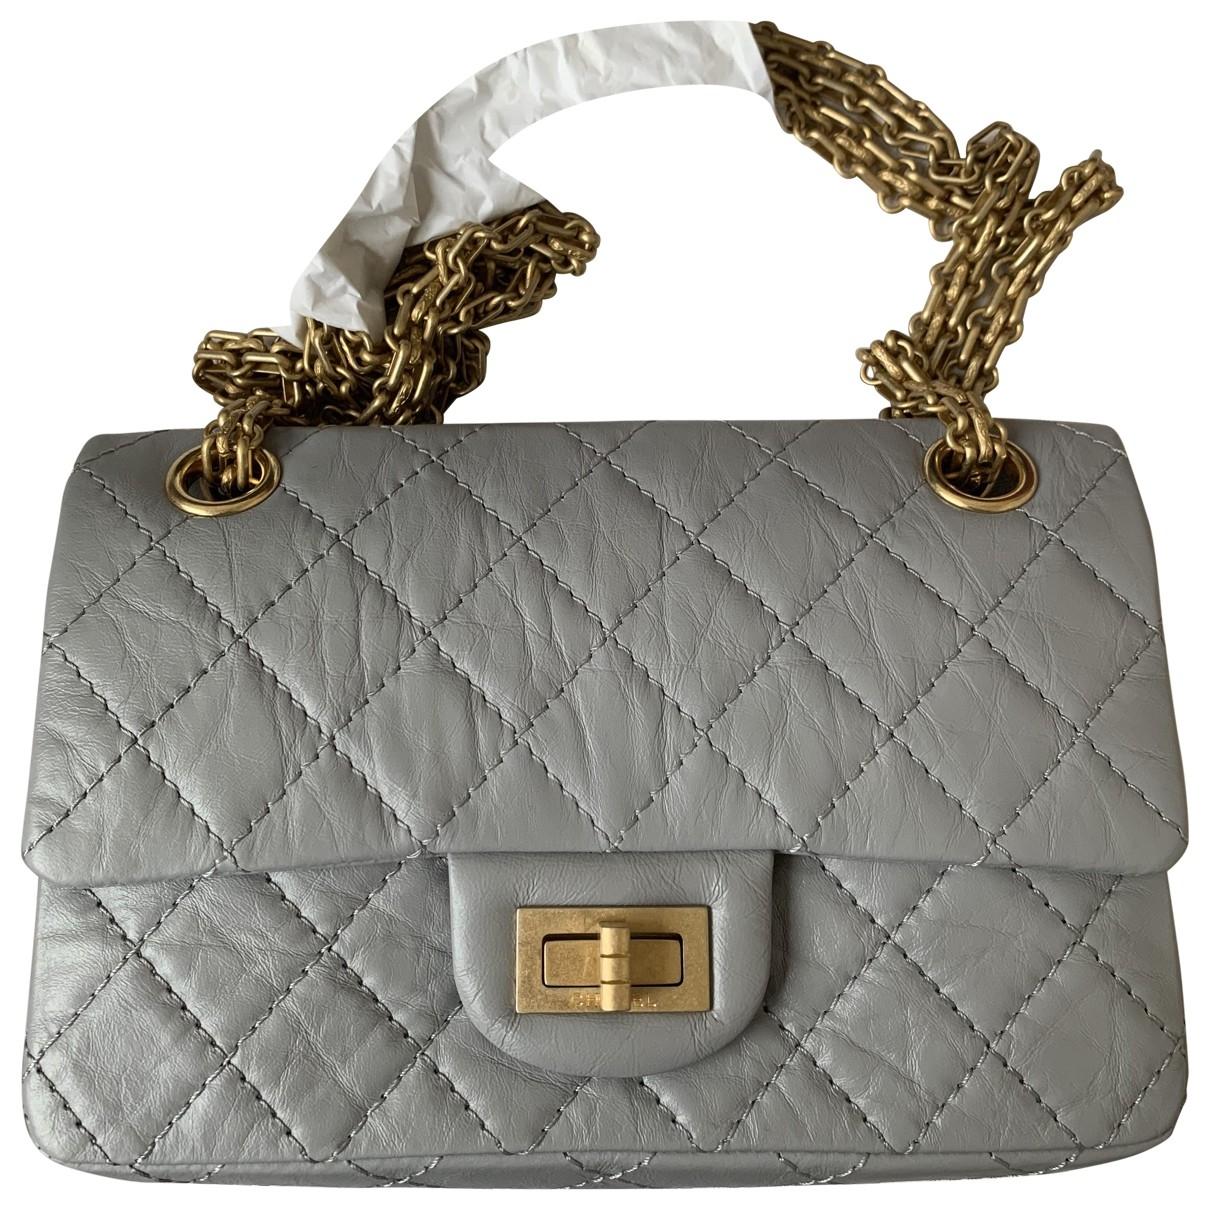 Chanel 2.55 Handtasche in  Grau Leder